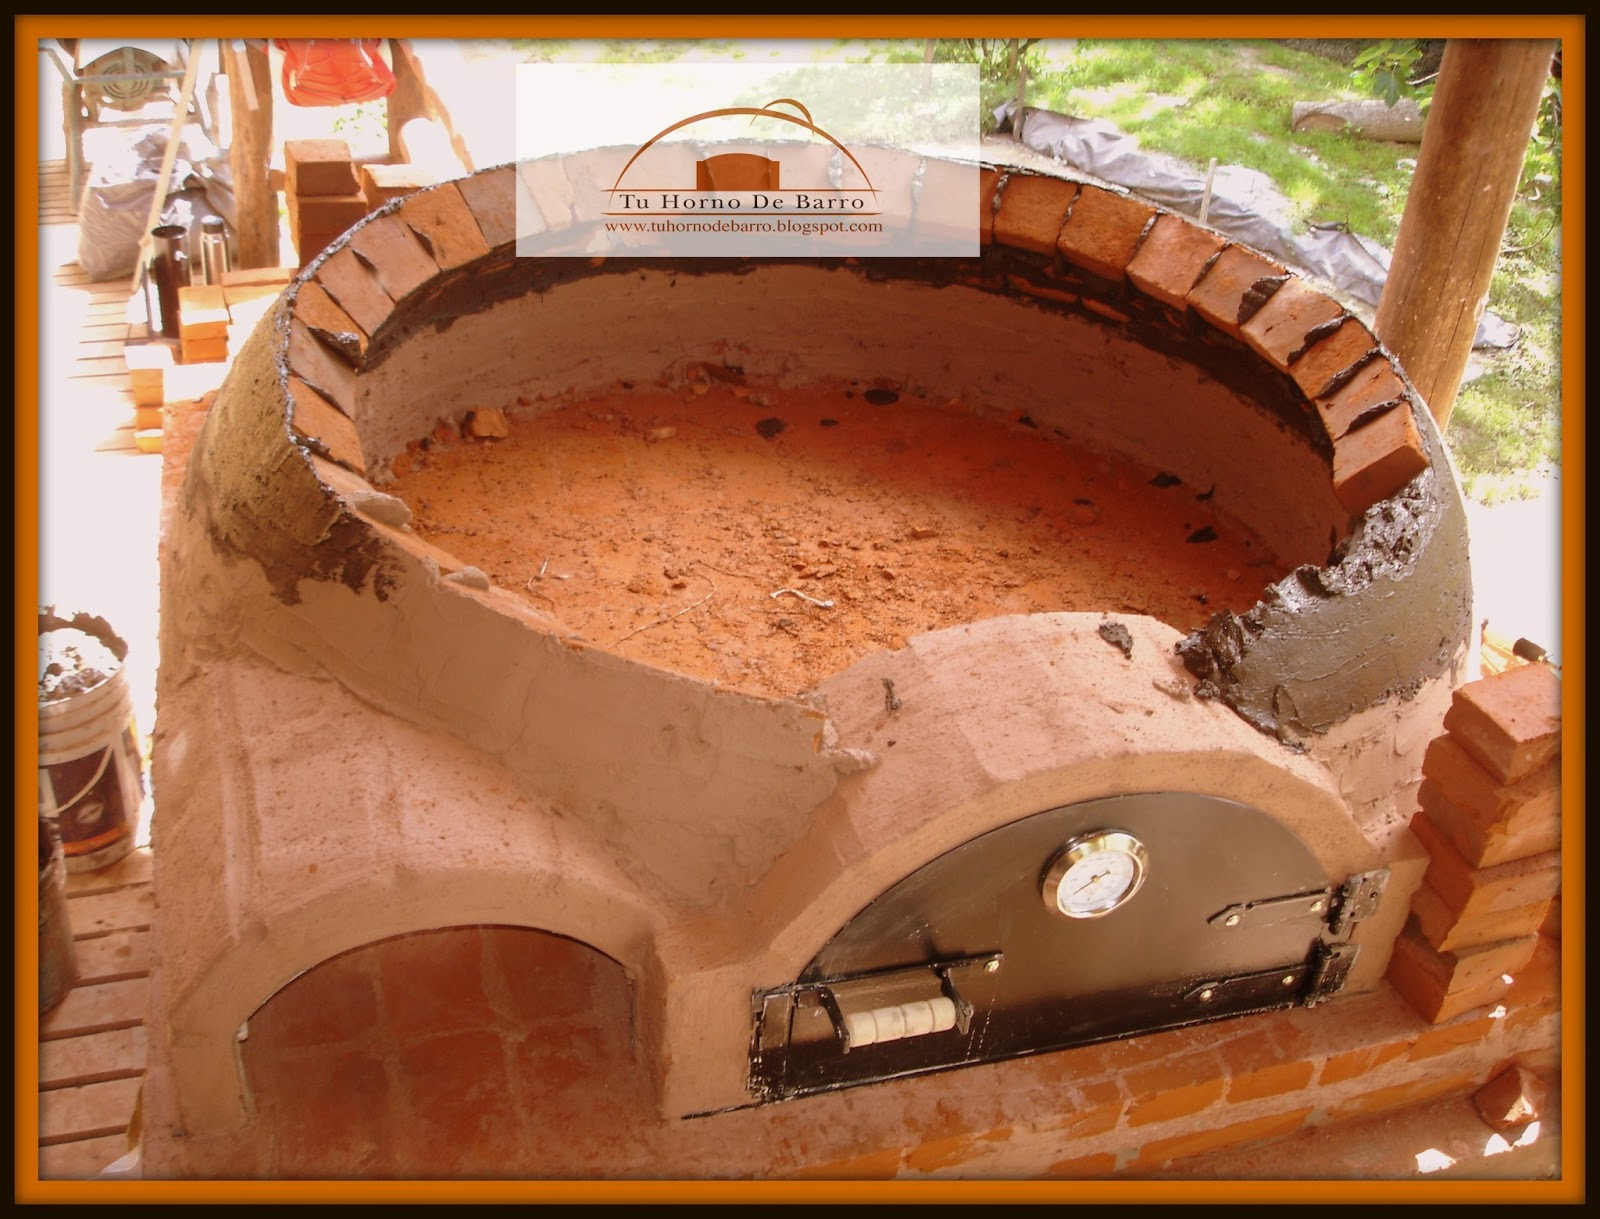 Hornos de barro artesanales gastron micos horno de barro for Construccion de un vivero paso a paso